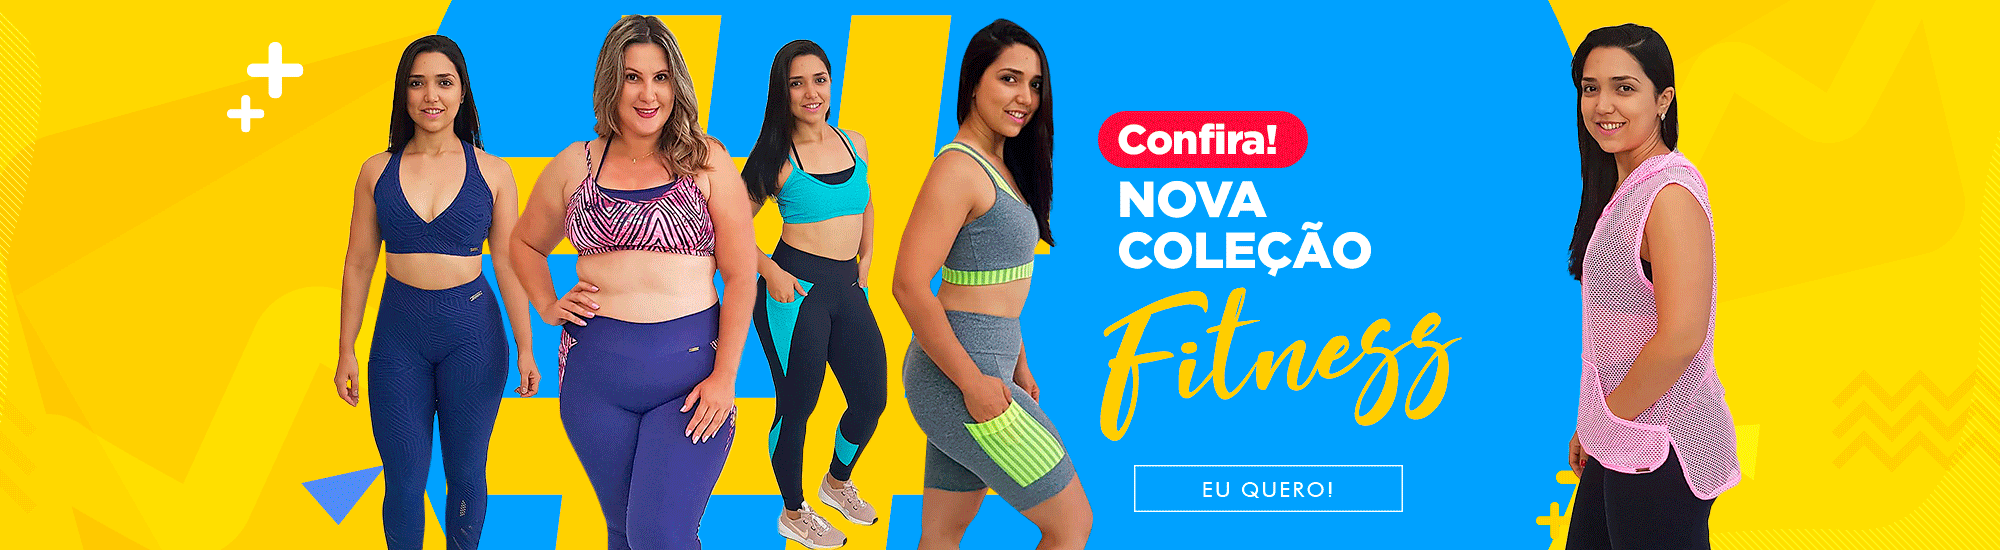 Aqui tem moda fitness!!